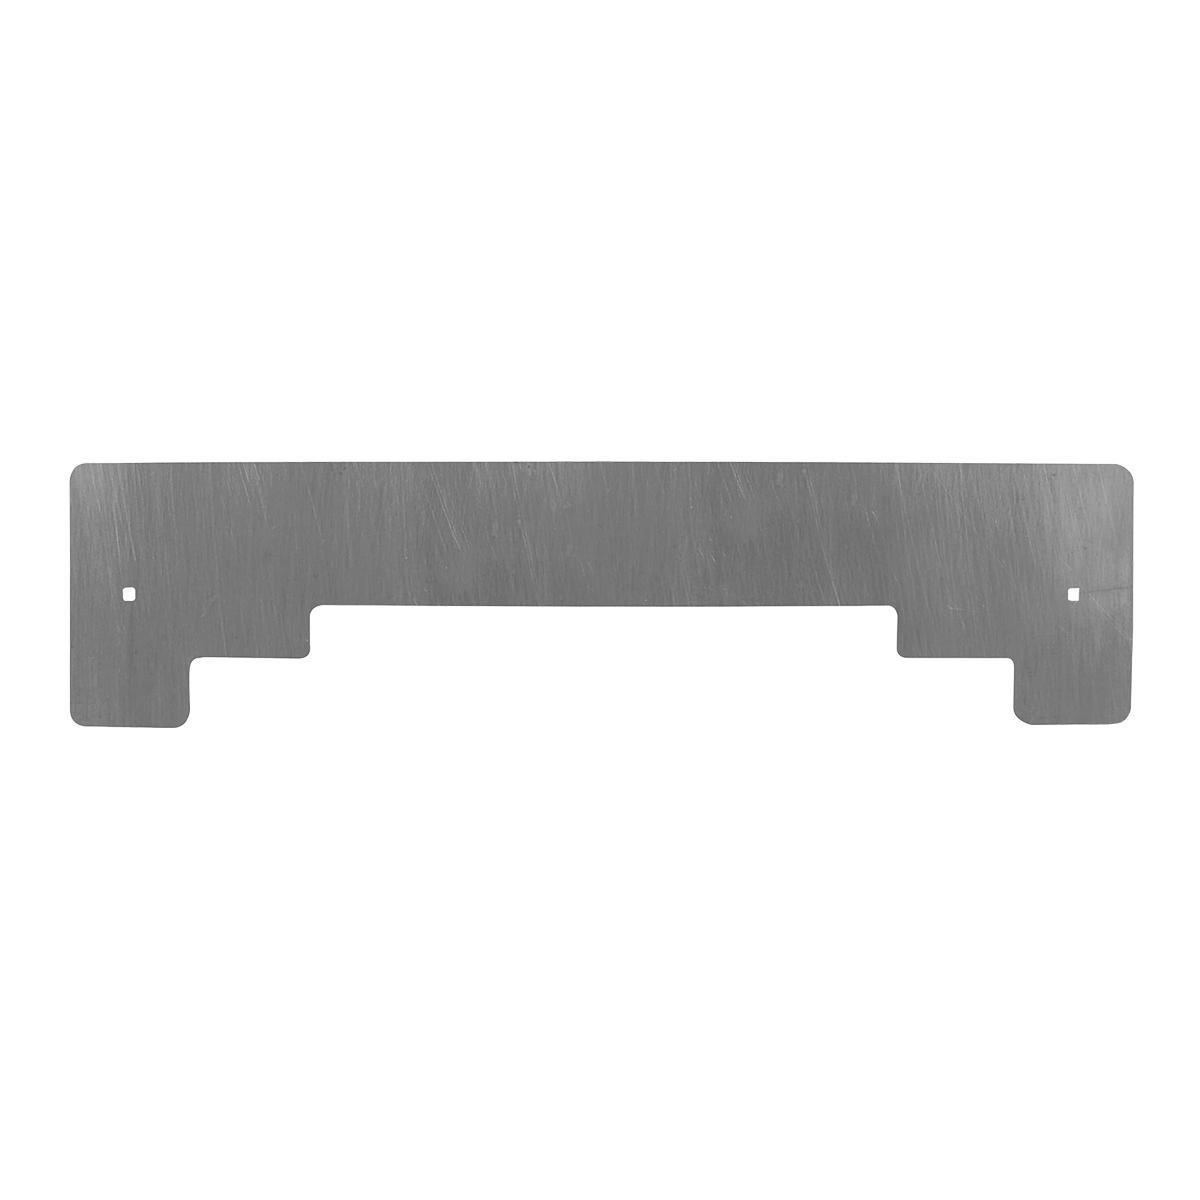 Chrome Plated Steel Step Style Bottom Mud Flap Plate with Backing Plate - Backing Plate View